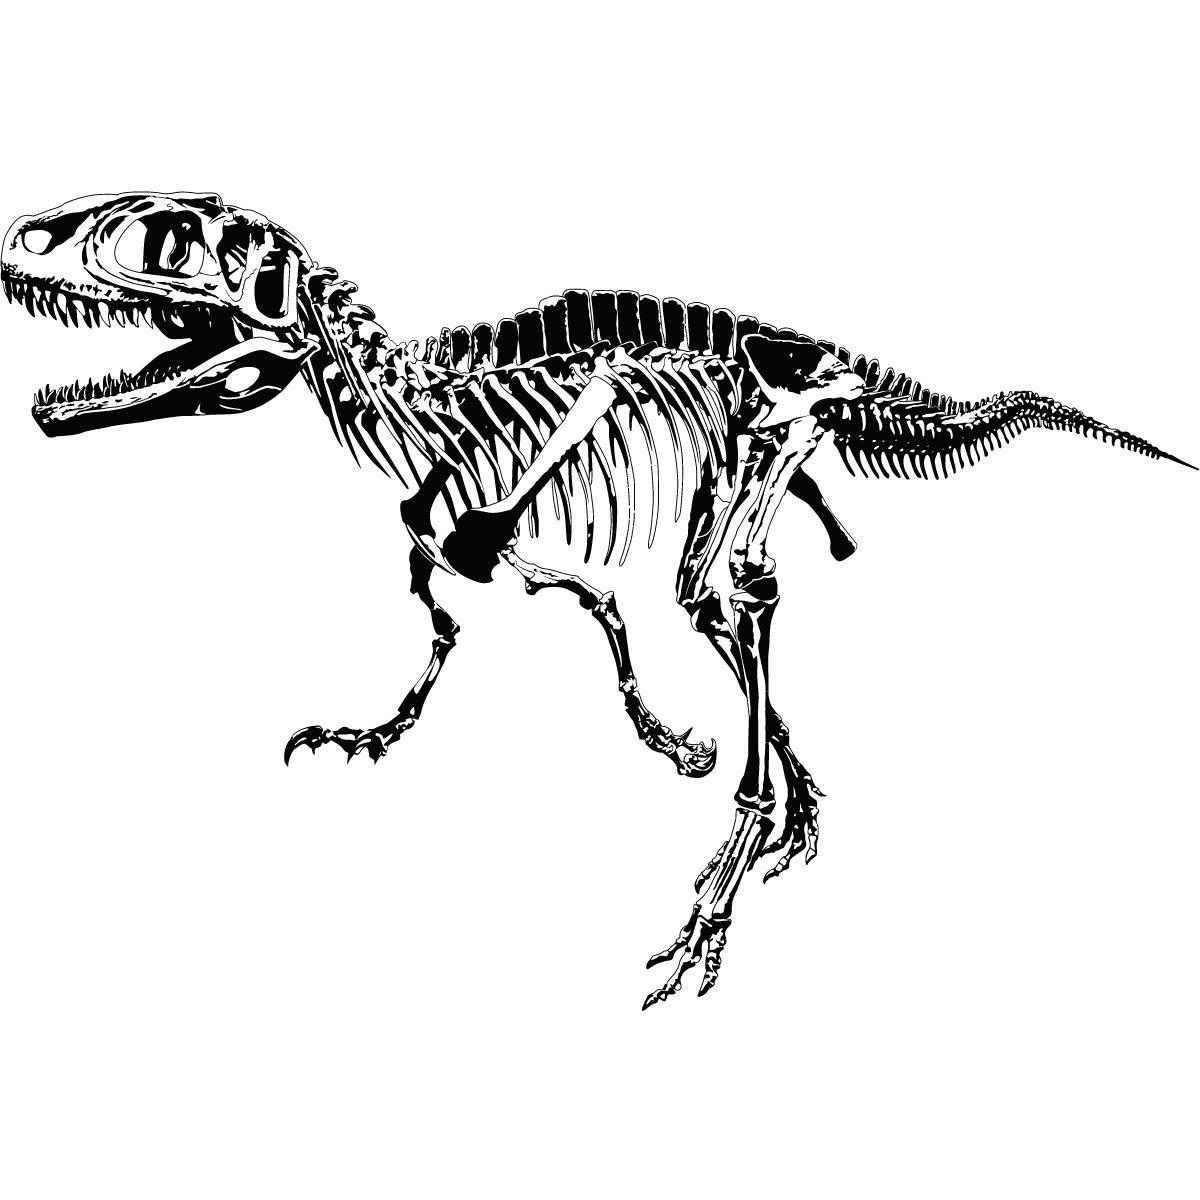 Details About T Rex Skeleton Dinosaurs Wall Art Sticker